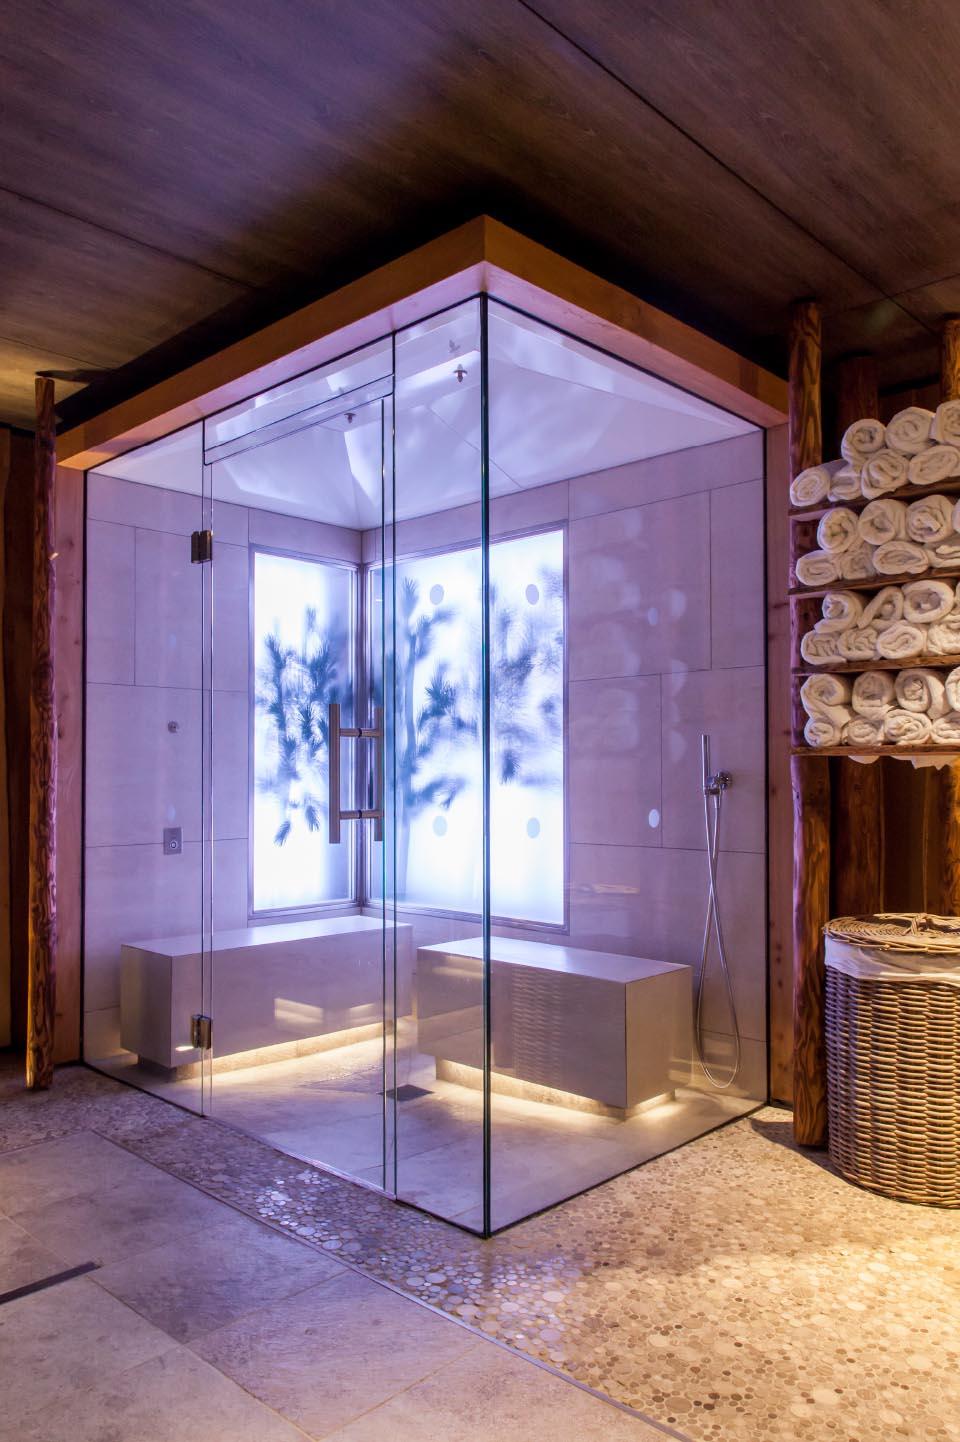 Champneys-Forest-Mere-Spa-Interior-Design-salt-steam-room